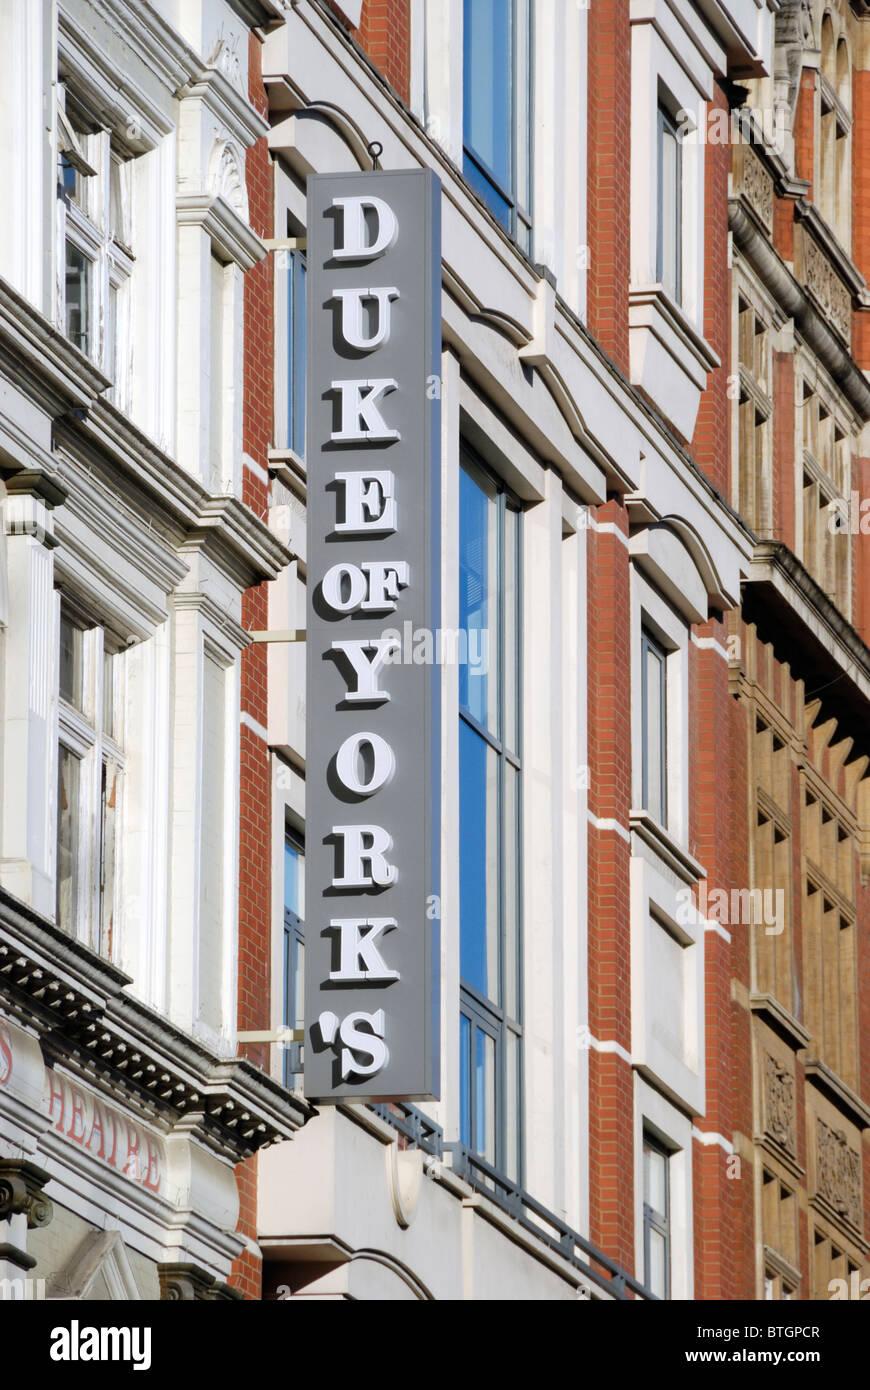 Duke of York's Theatre in St Martin's Lane, London, England - Stock Image